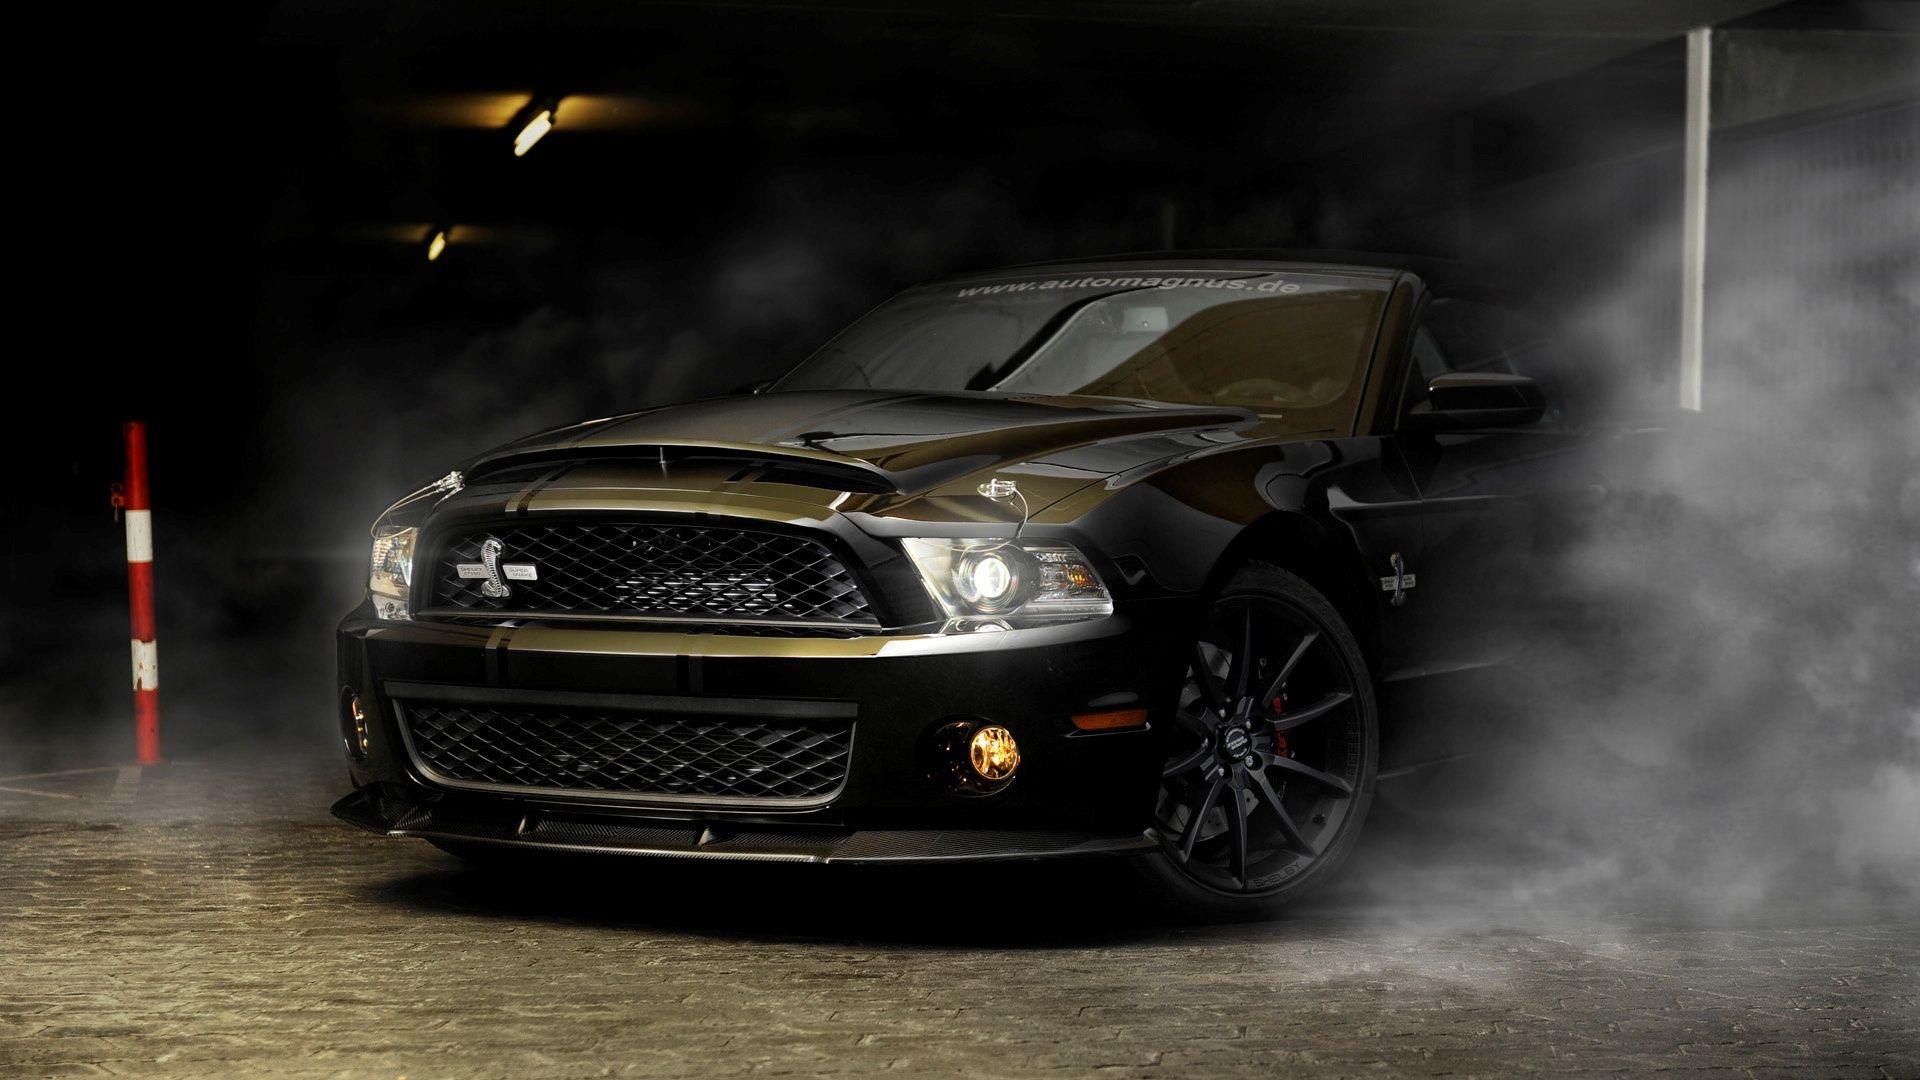 Shelby Mustang Wallpaper Desktop Tz8 Cars Ford